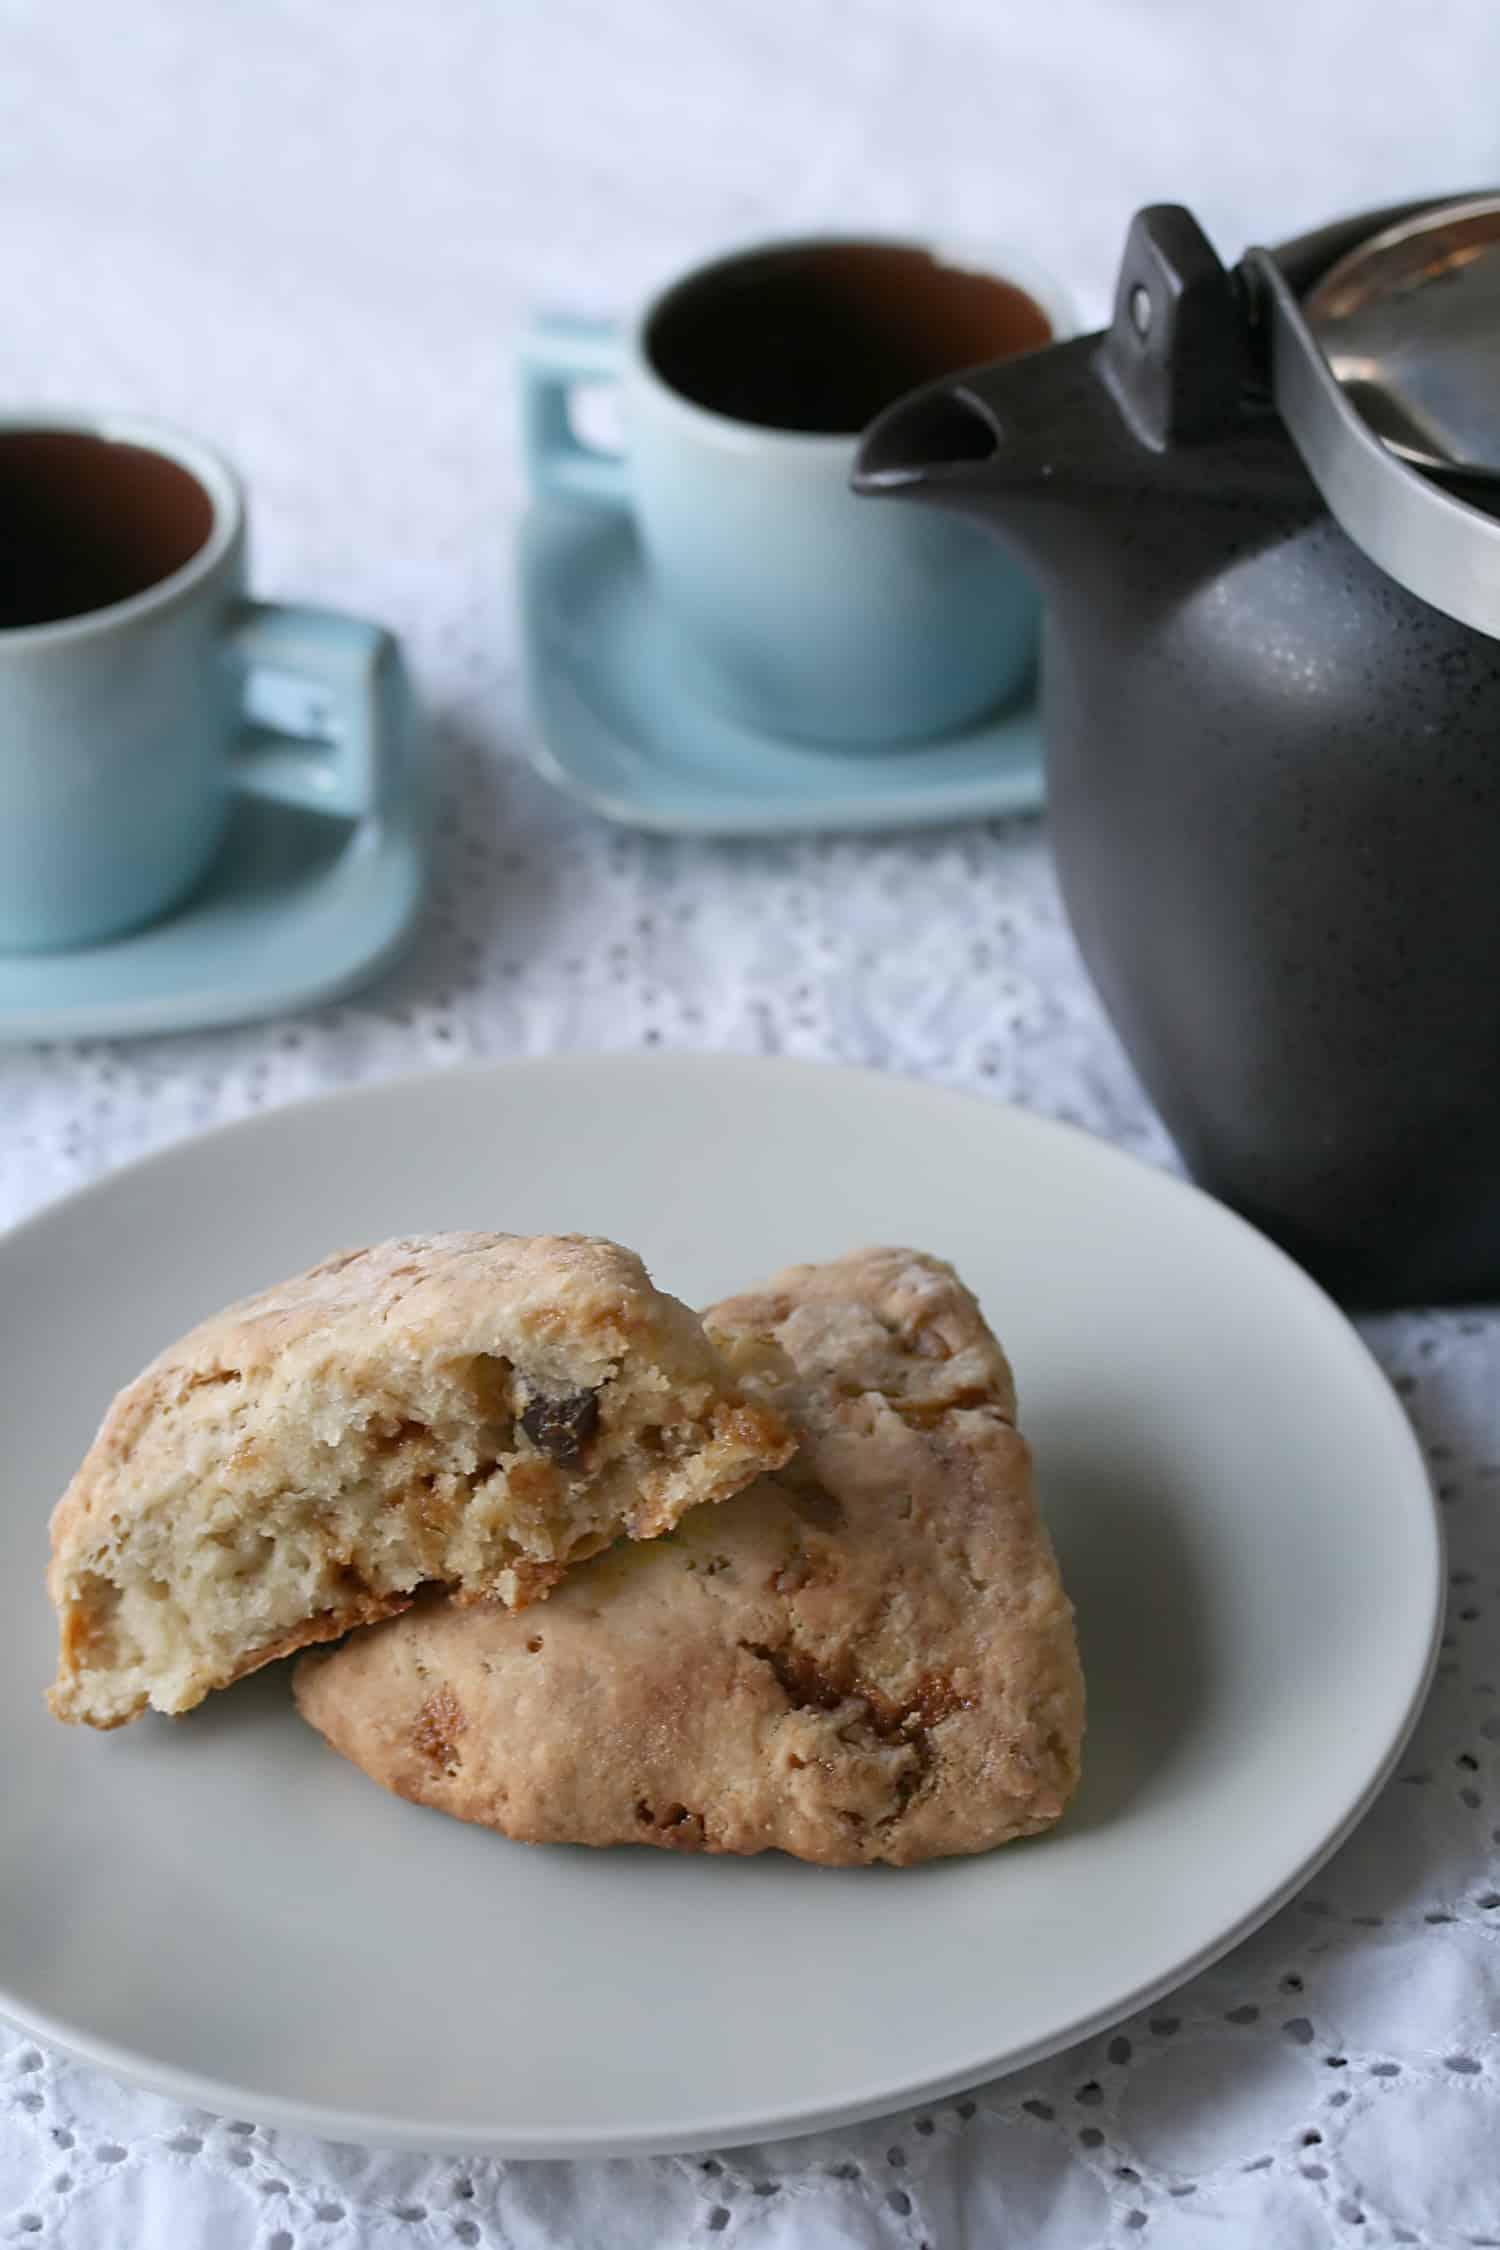 Toffee-Date Scones